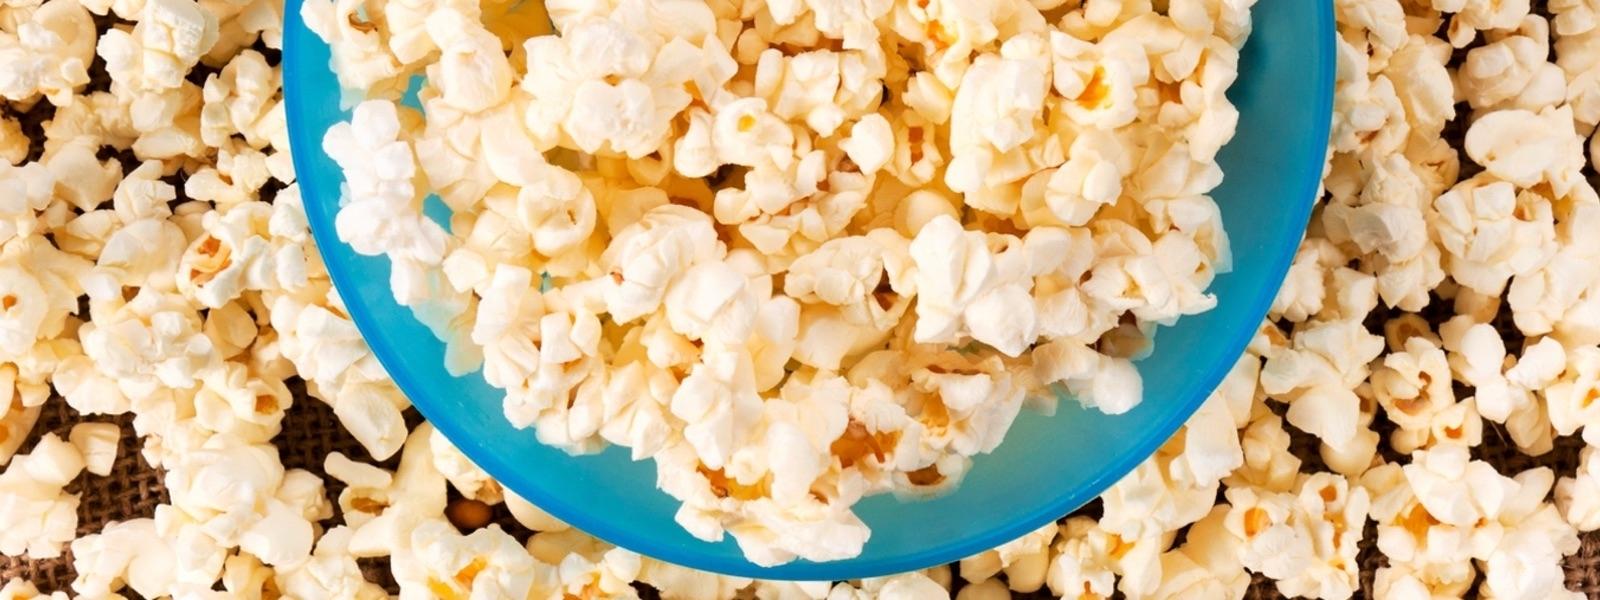 Popcorn Perth - Popcorn Australia